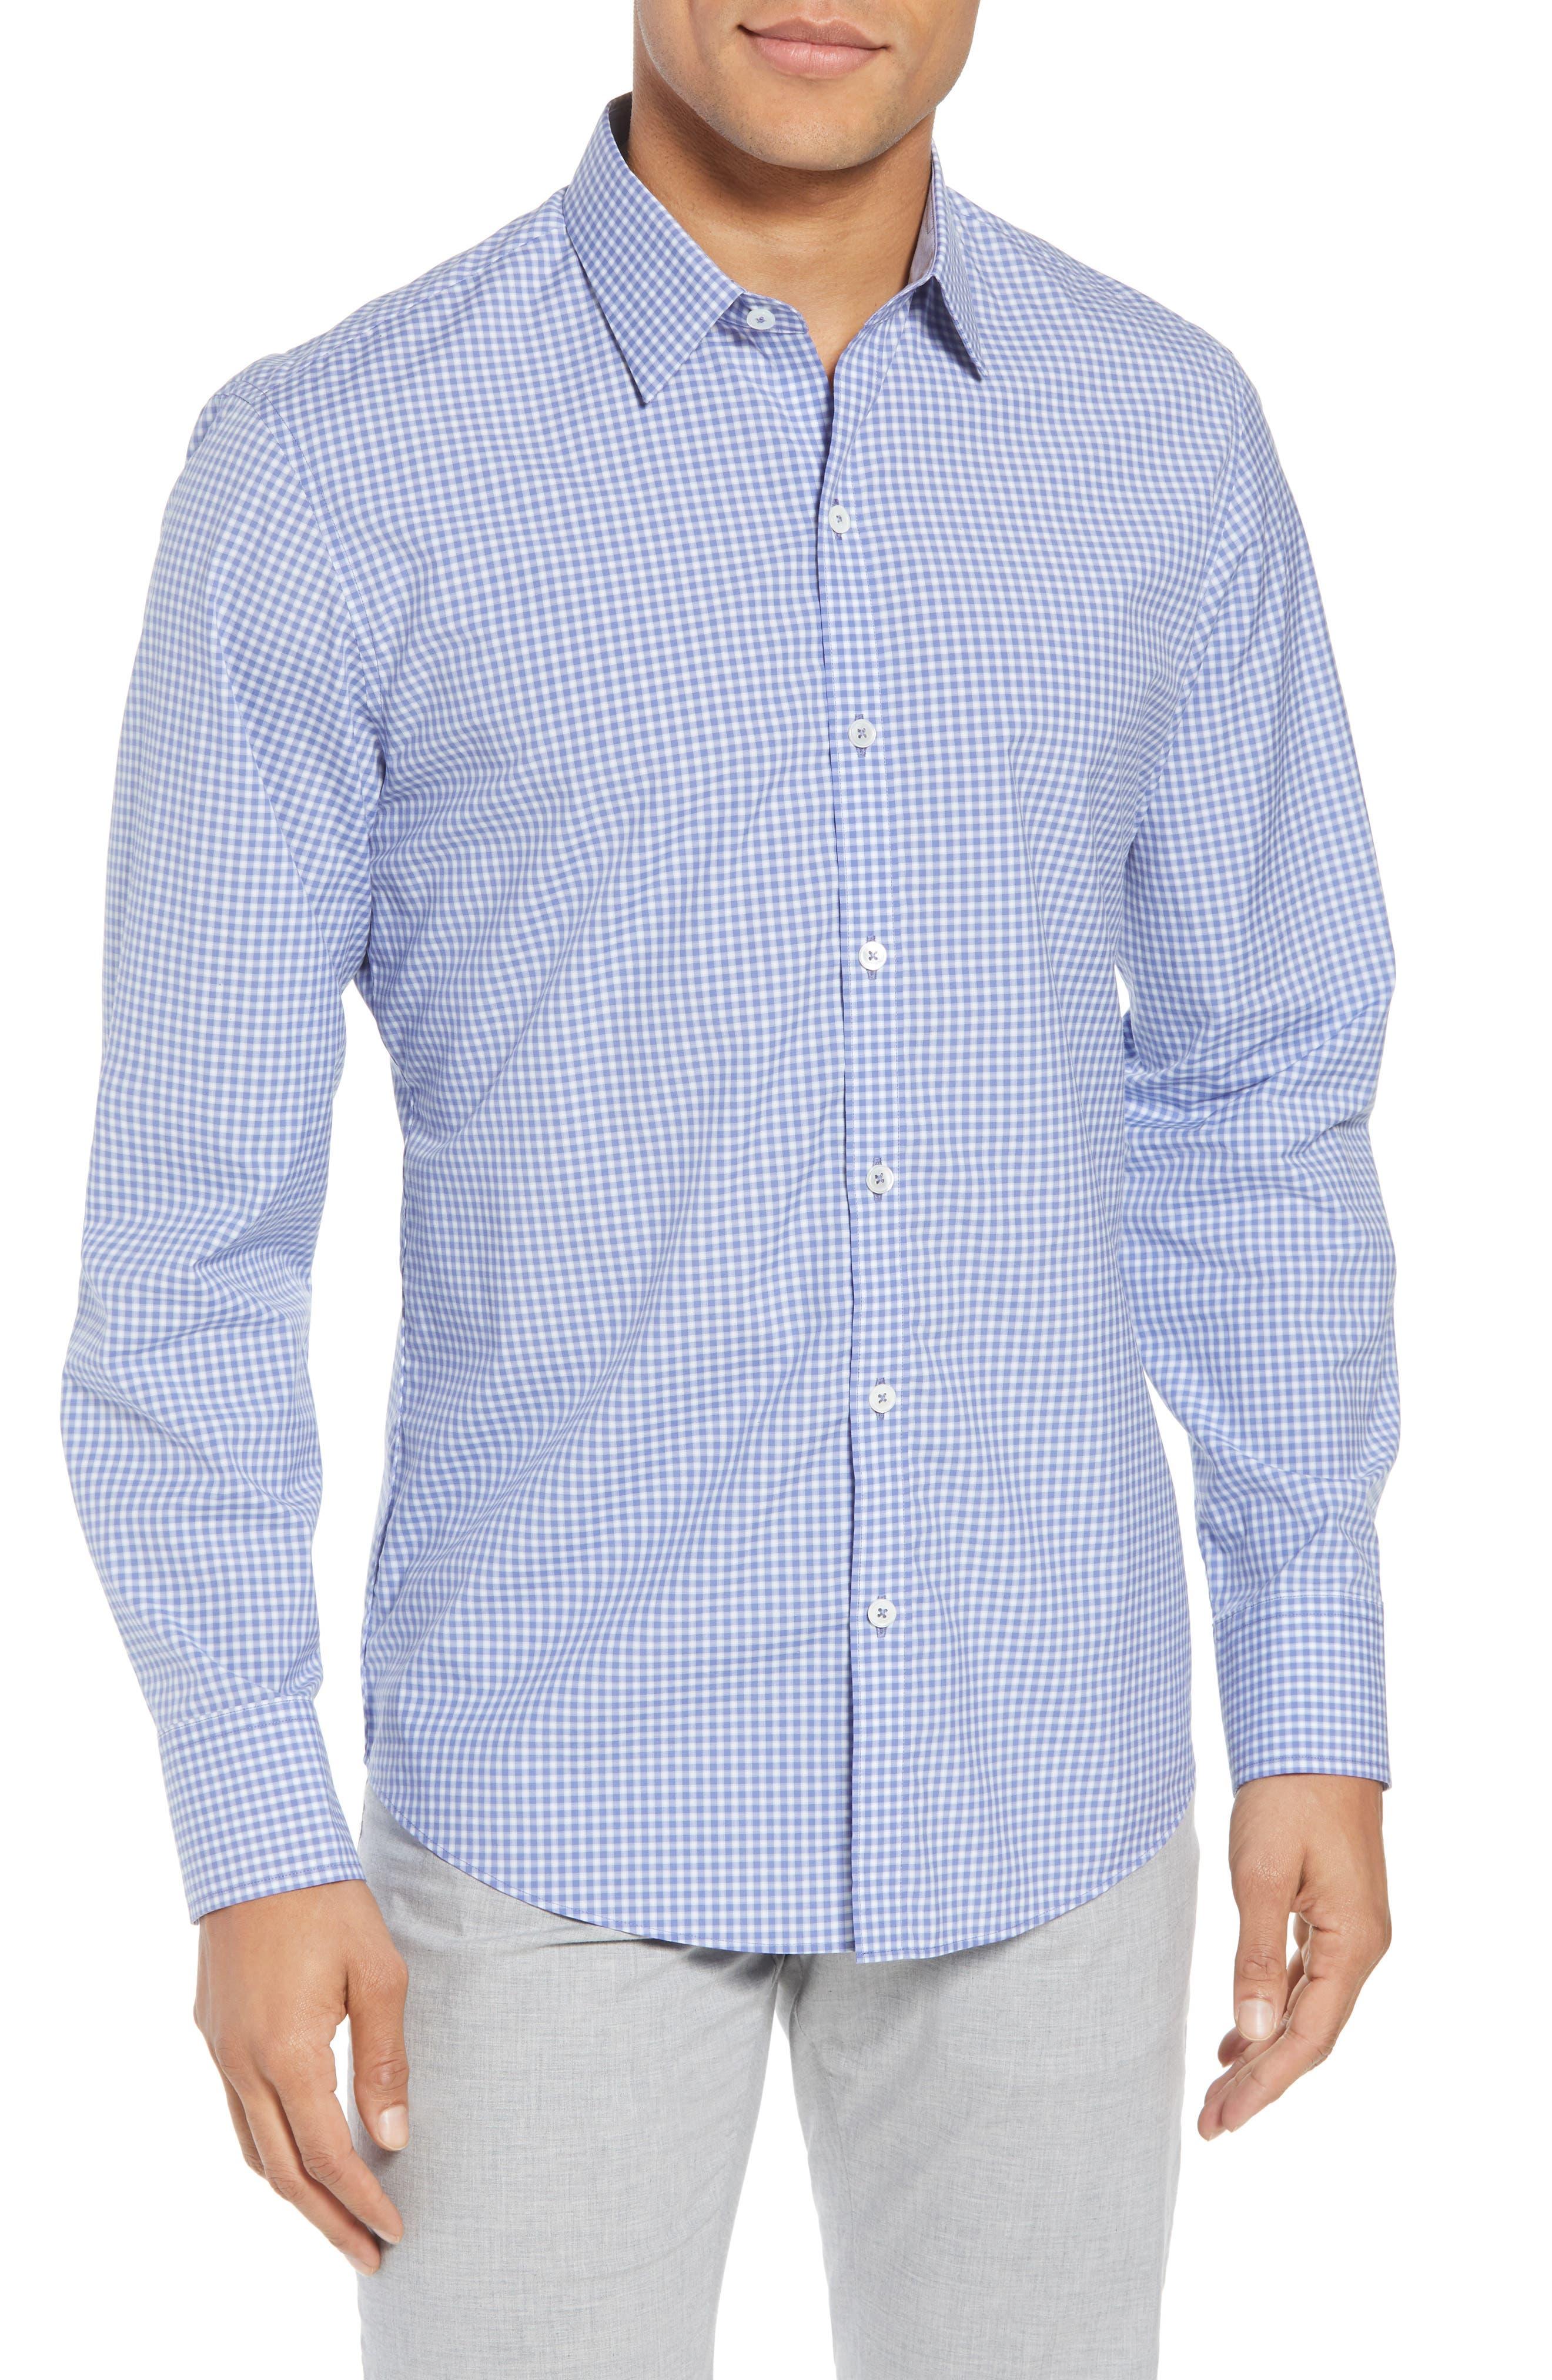 Winston Regular Fit Sport Shirt,                         Main,                         color, Ocean